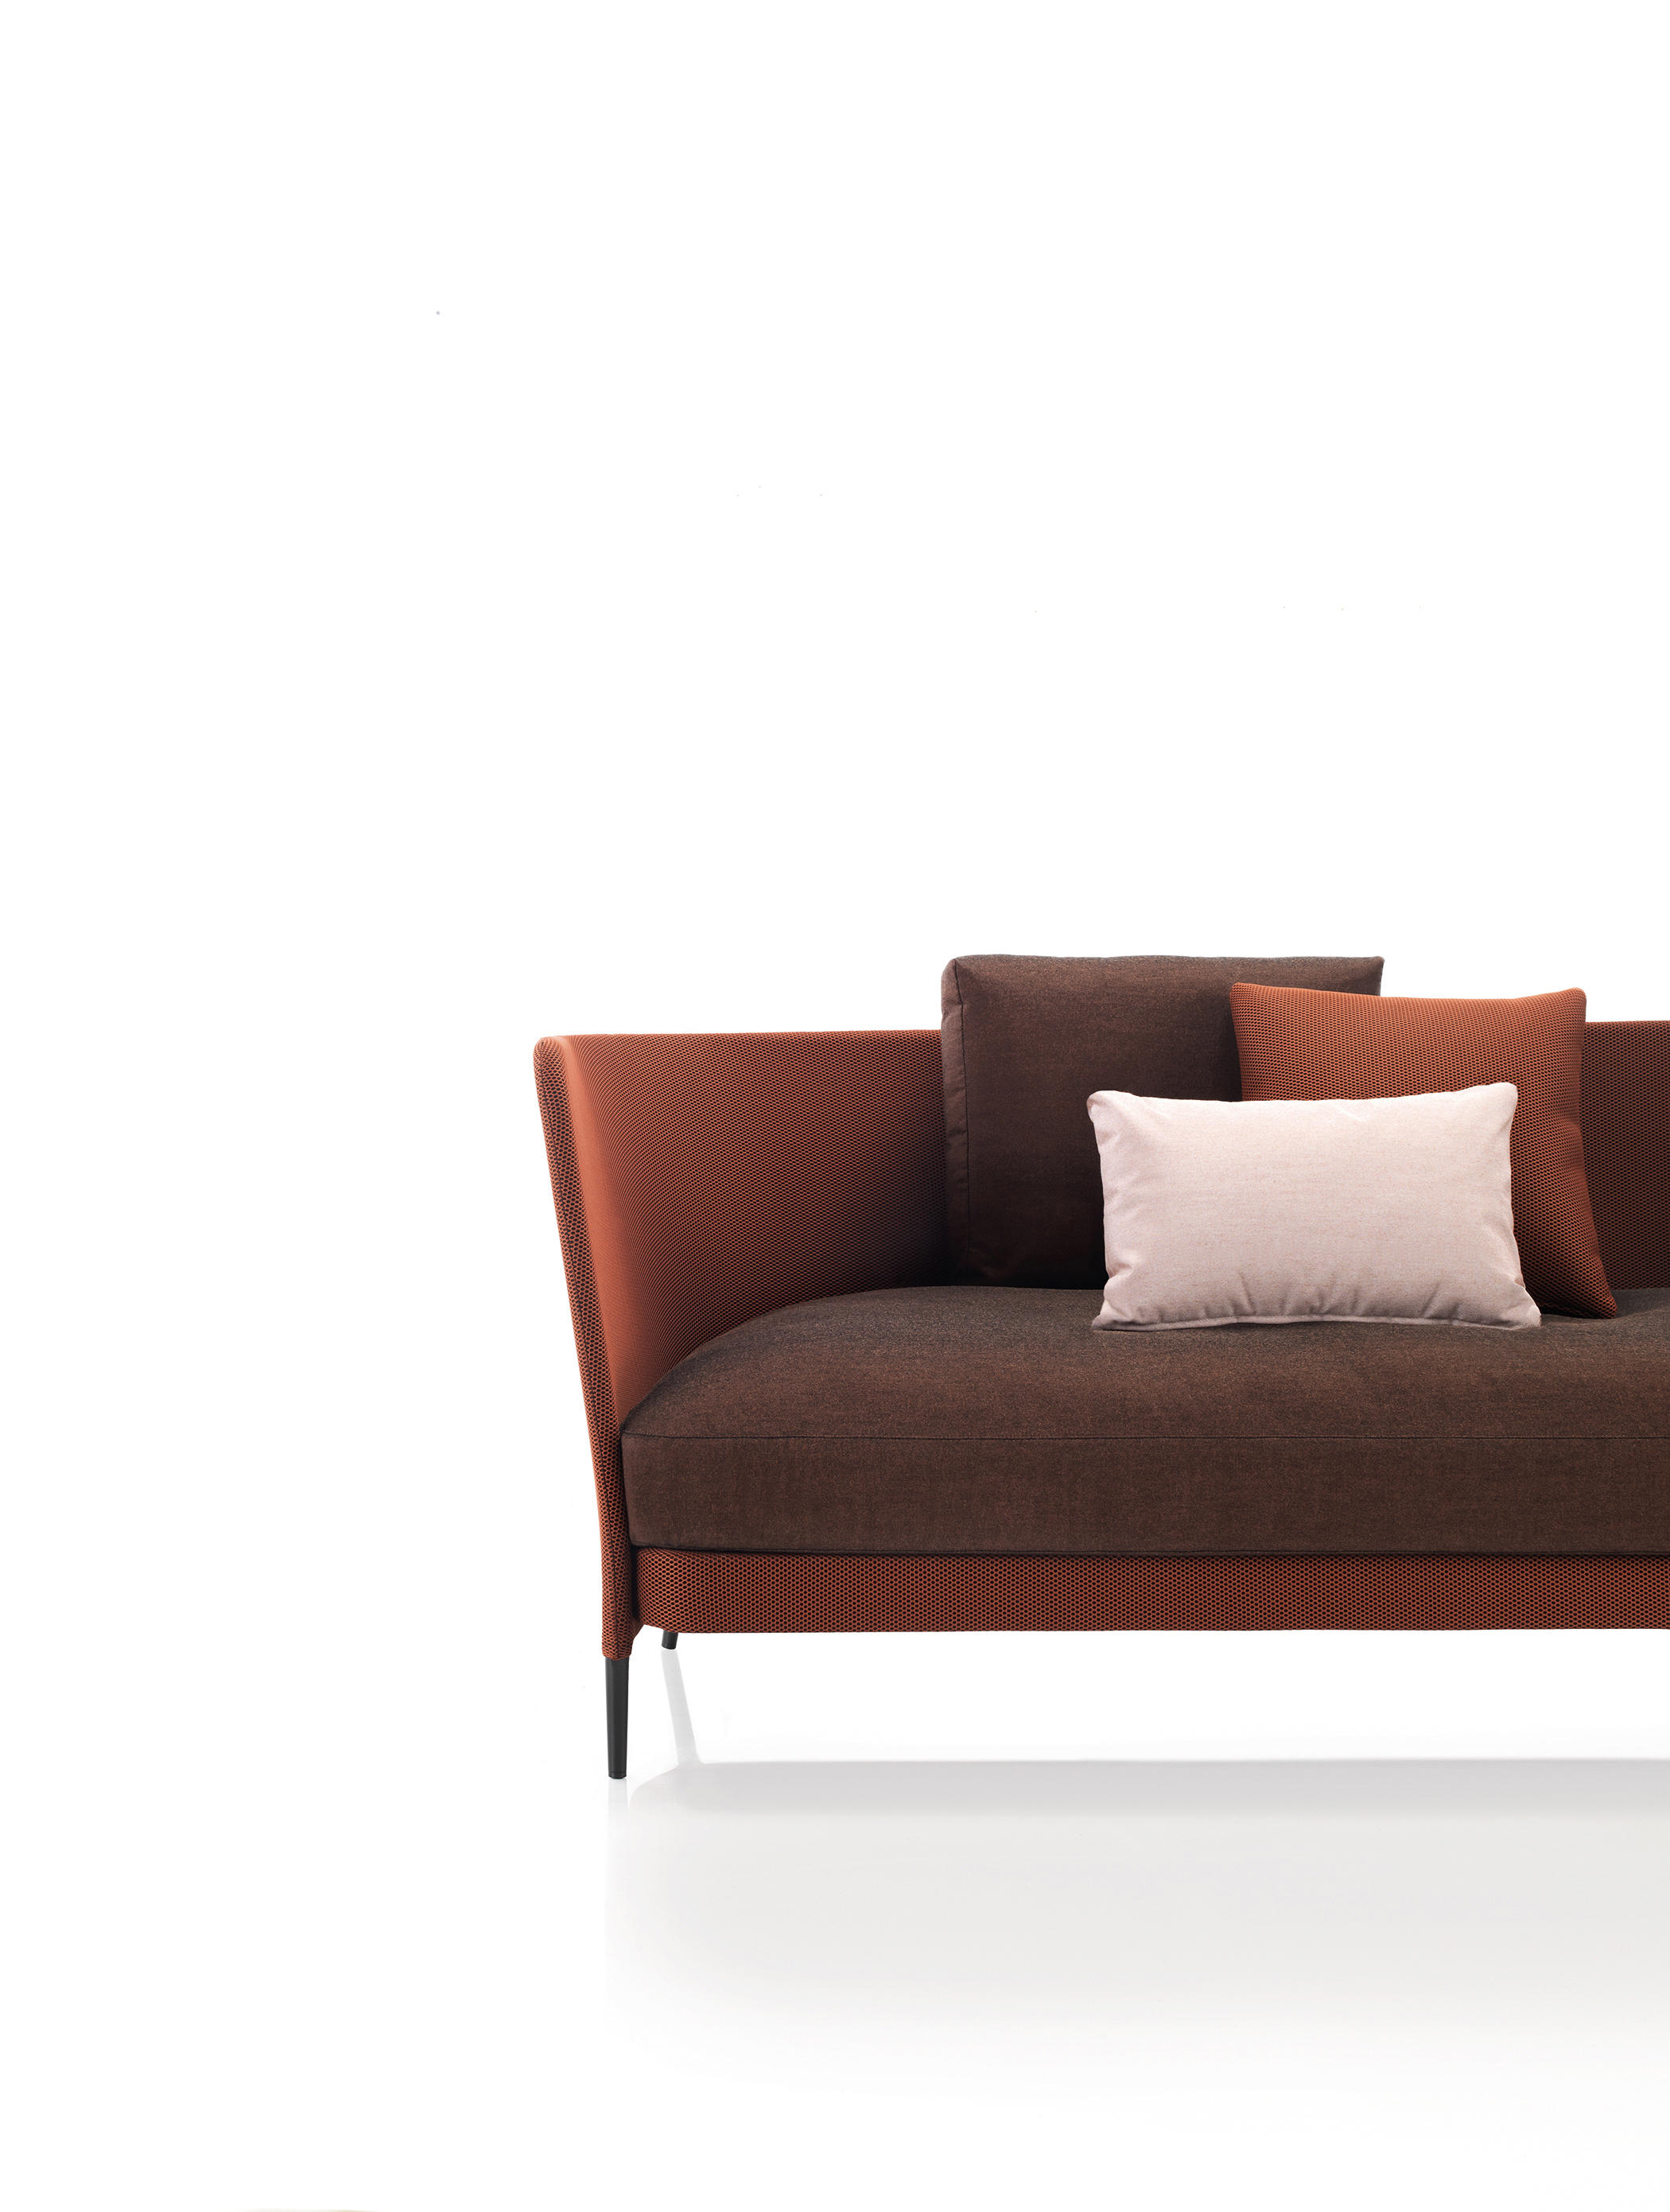 KÄBU SOFA - Sofas from Expormim   Architonic on glider sofa, couch sofa, cushions sofa, lounge sofa, bench sofa, recliner sofa, divan sofa, pillow sofa, art sofa, bookcase sofa, mattress sofa, fabric sofa, settee sofa, table sofa, storage sofa, futon sofa, ottoman sofa, beds sofa, bedroom sofa, chair sofa,